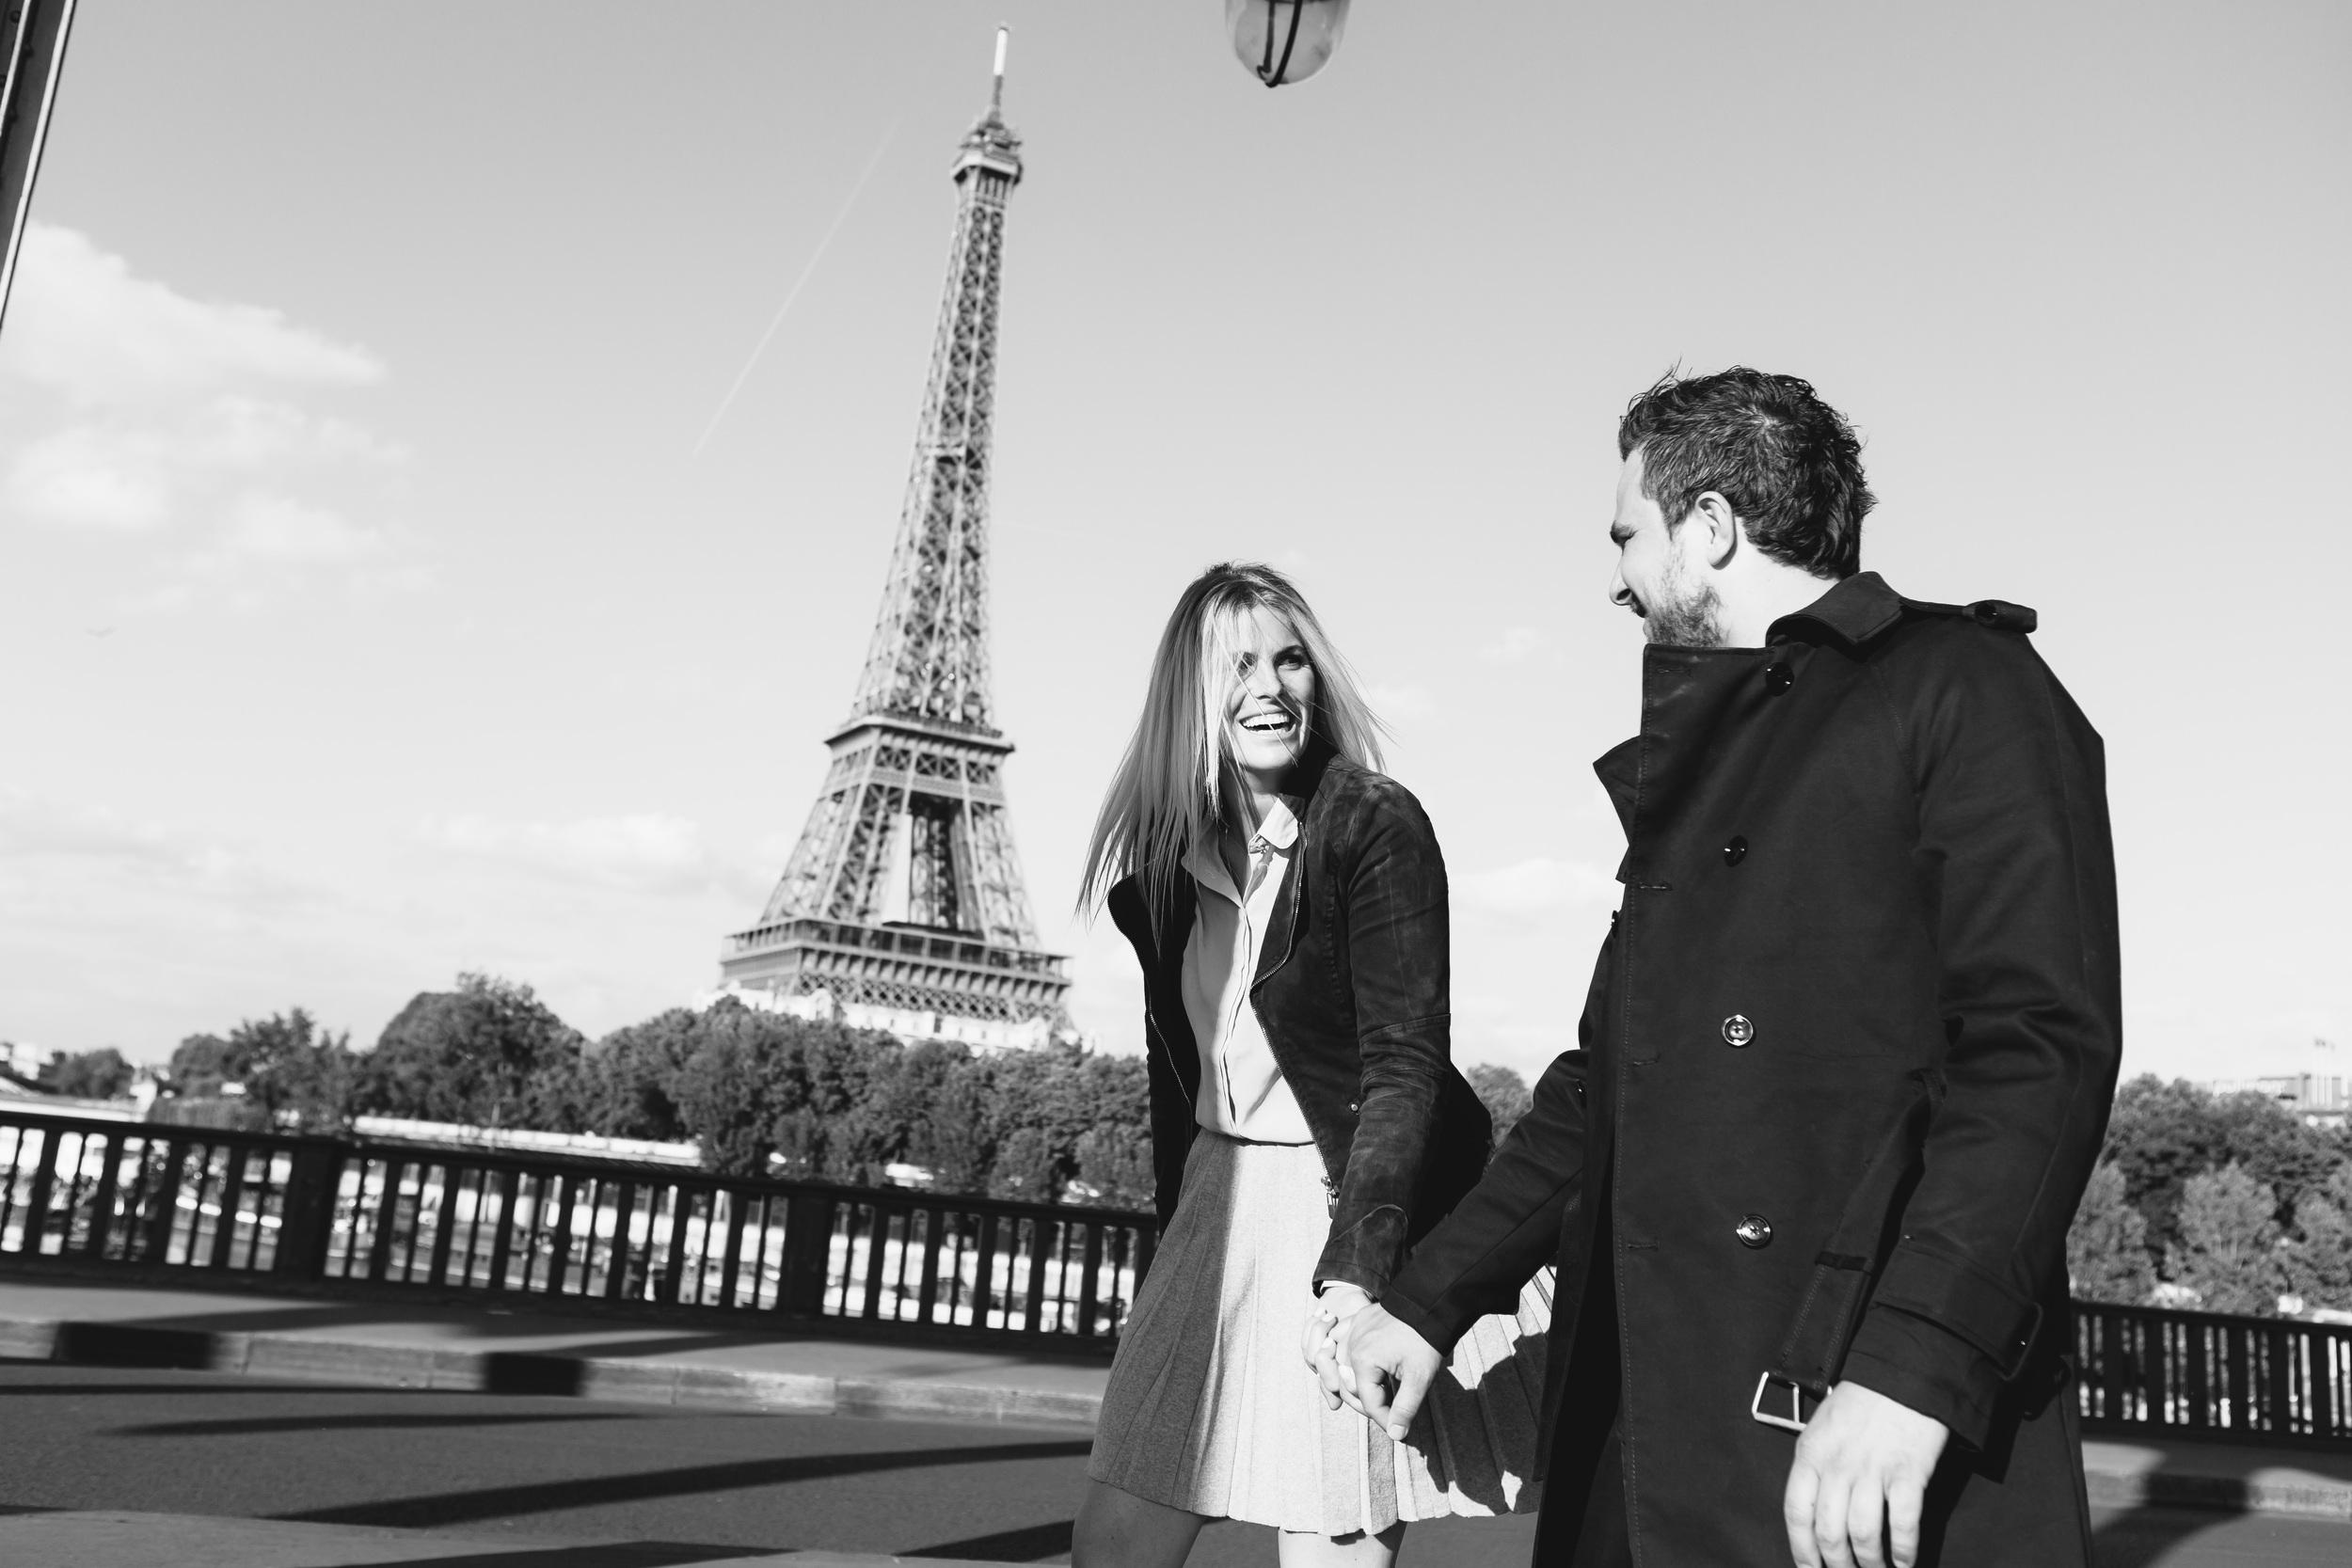 Photographer in Paris, Surprise Proposal, Eiffel Tower, Engagement, Bir Hakeim, Iheartparisfr